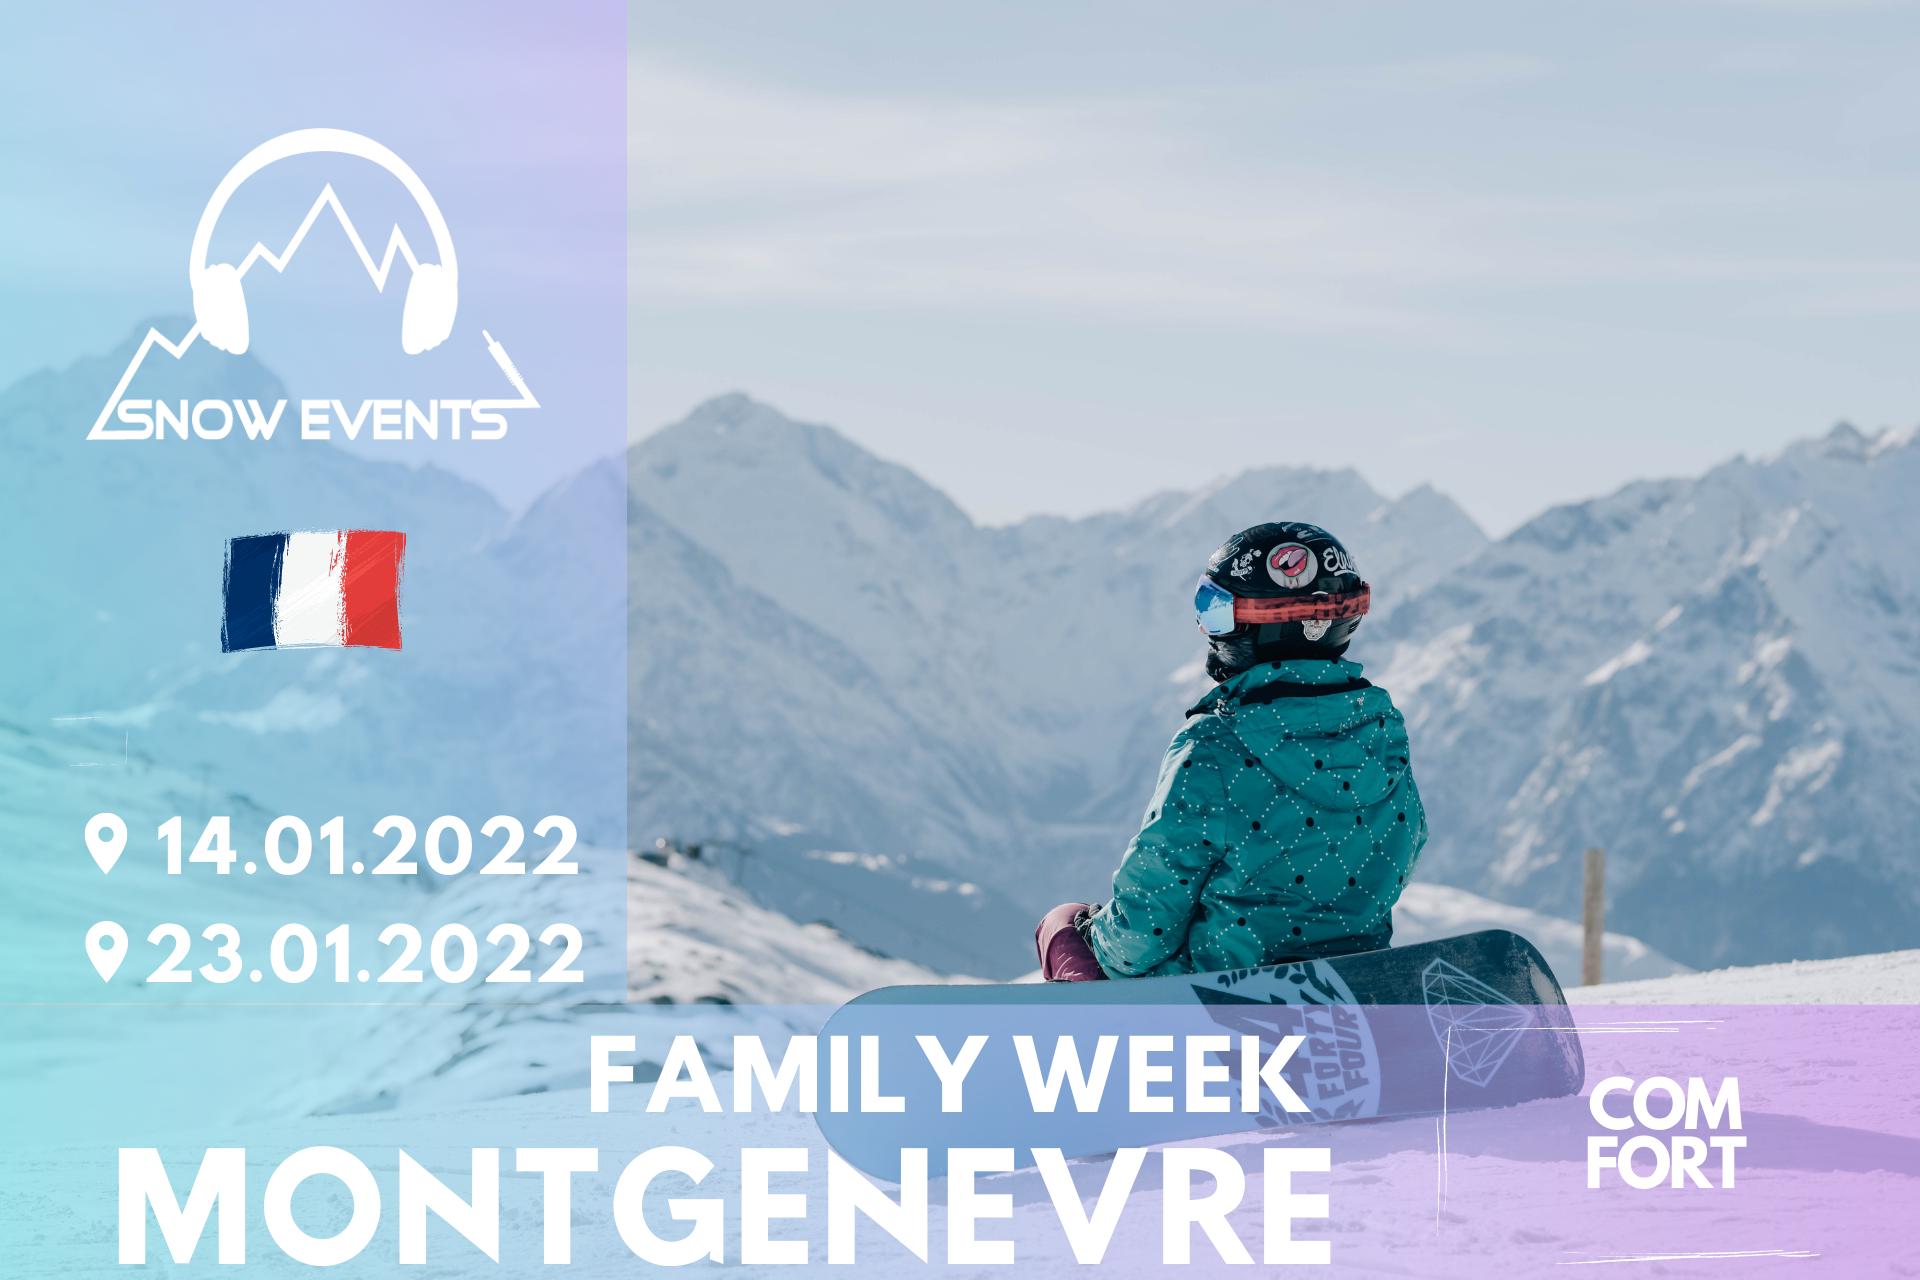 Family week BANER OFERTY -MONTGENEVRE